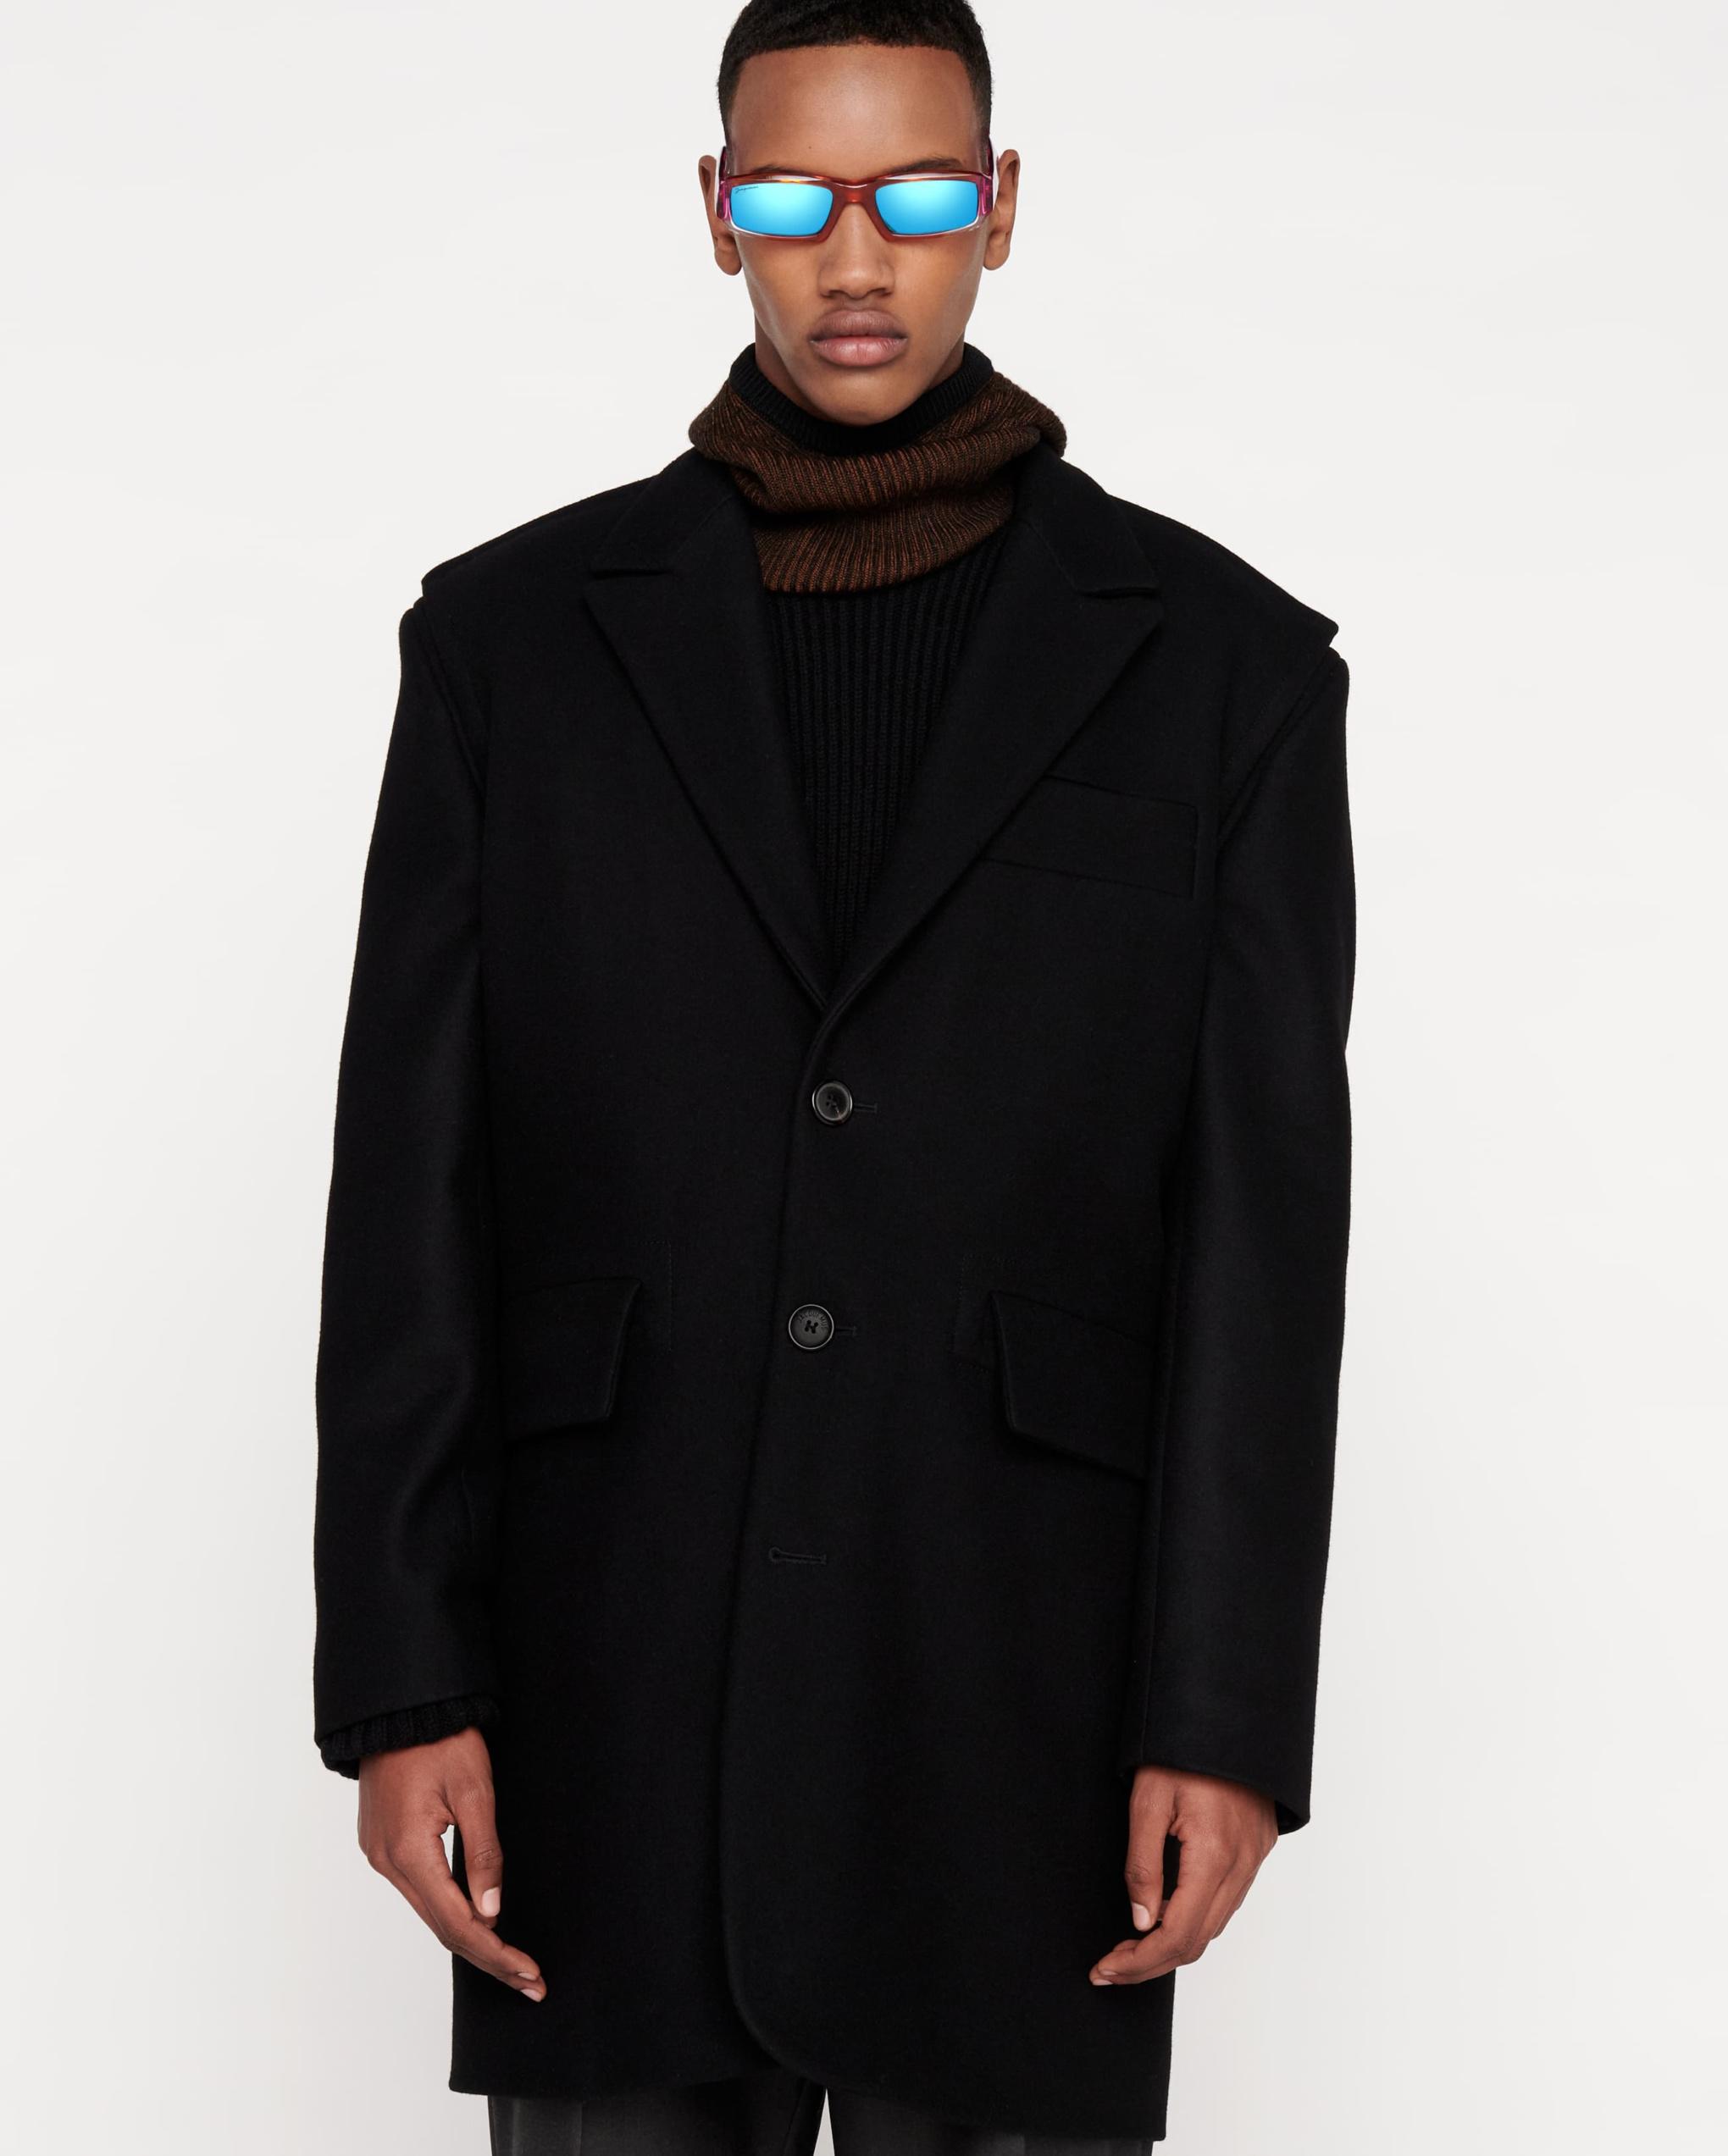 Le manteau Valdu